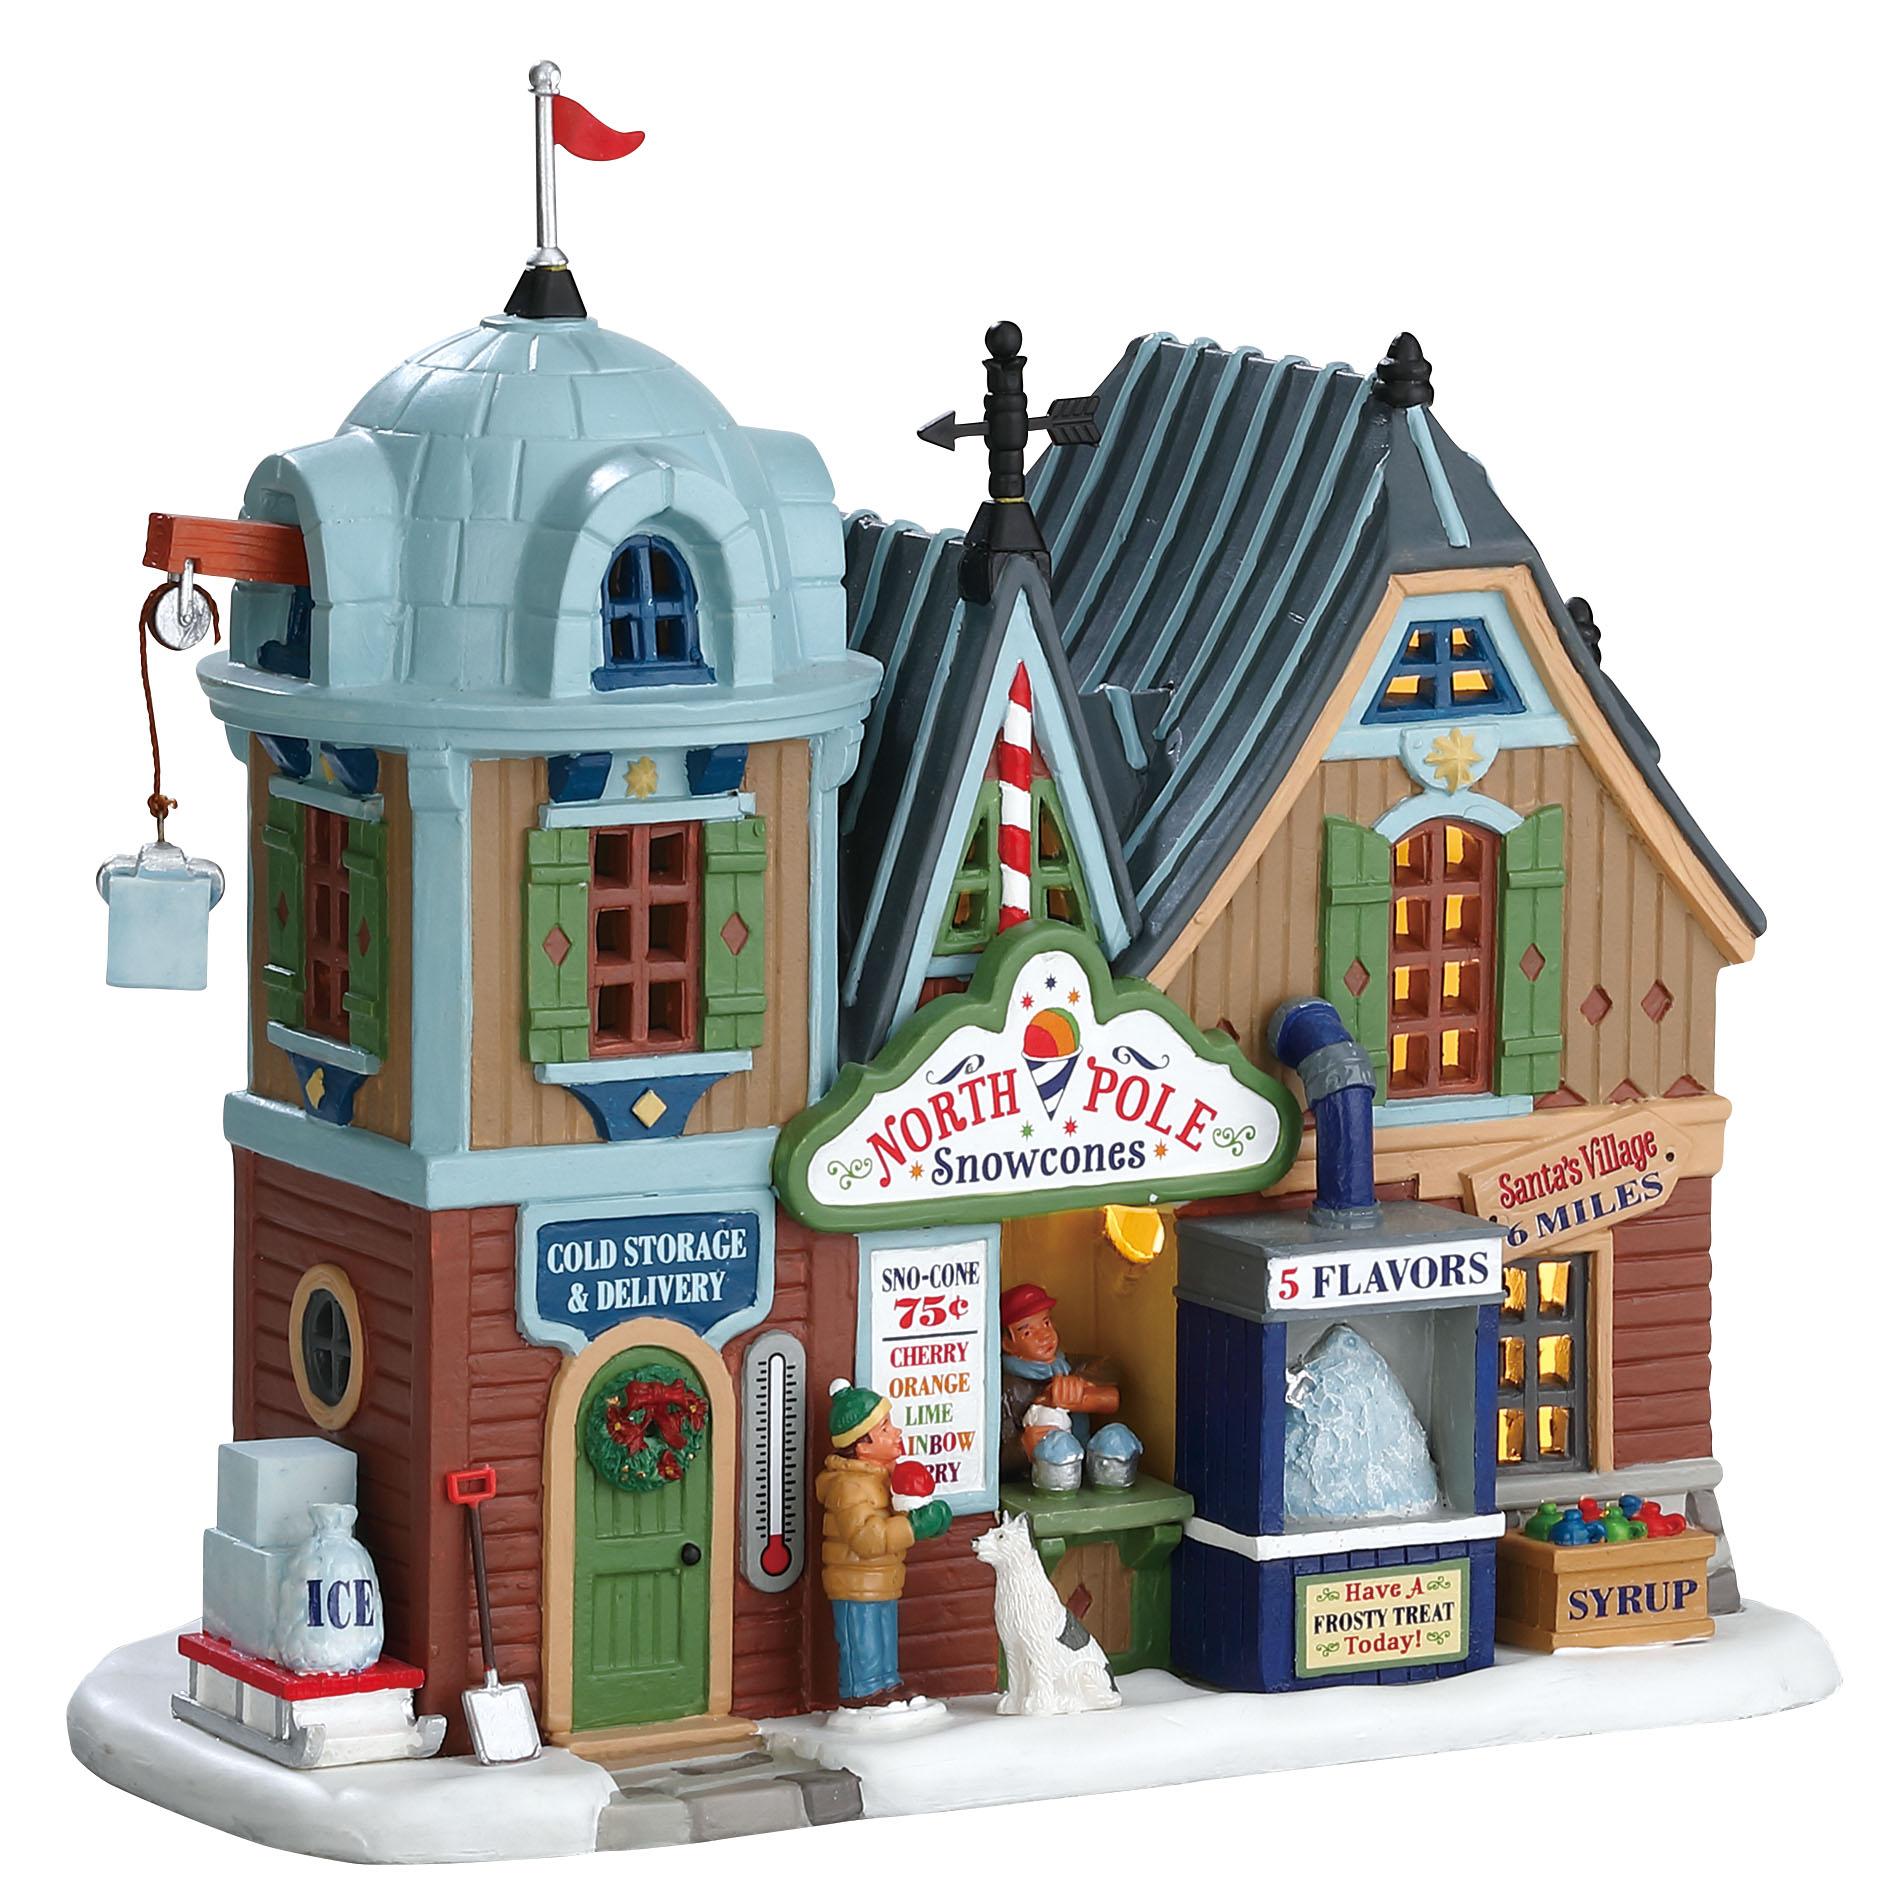 LIC LIMITED Christmas Village Building North Pole Snowcones